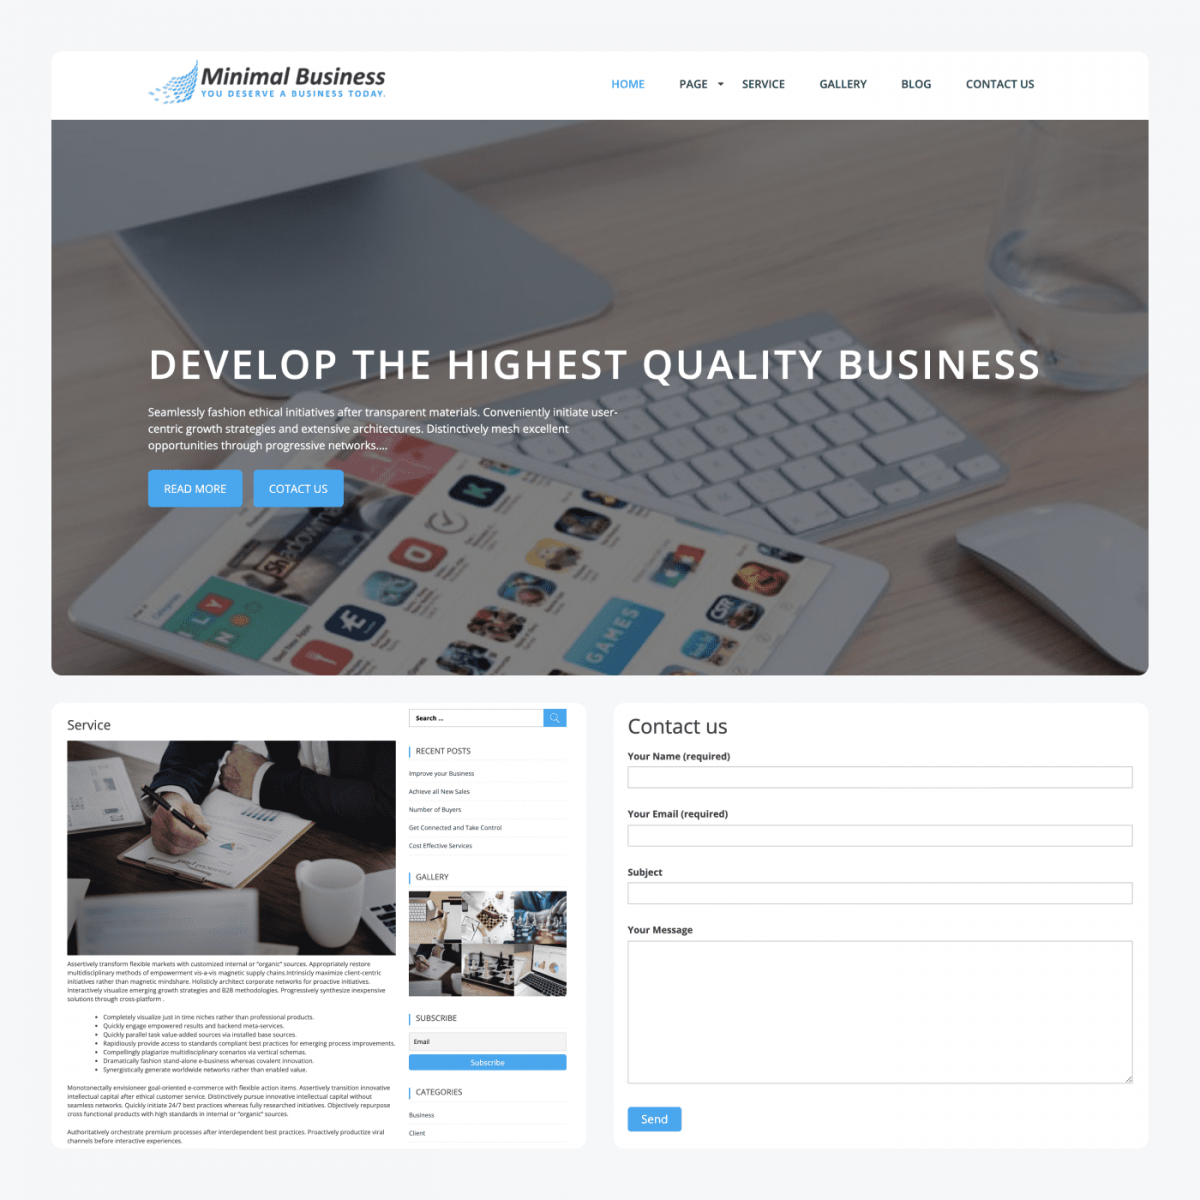 Minimal Business theme demo